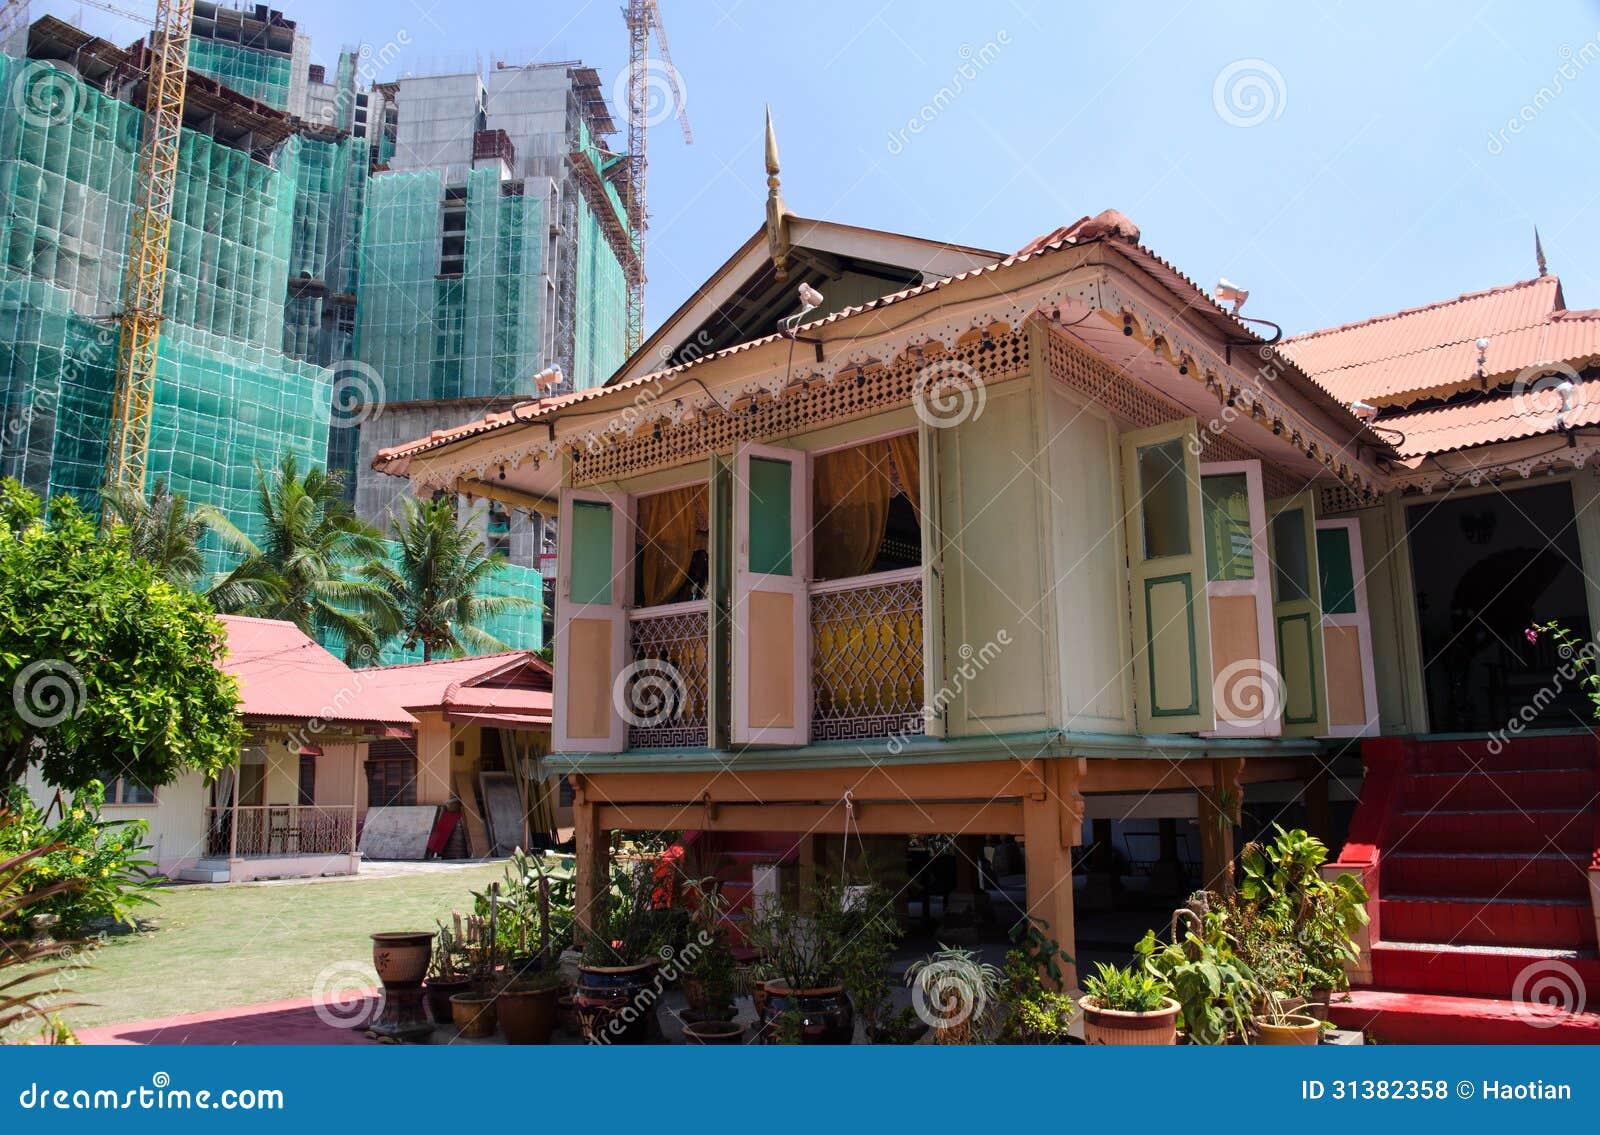 Villa Sentosa In Malacca oyalty Free Stock Photos - Image: 31382358 - ^